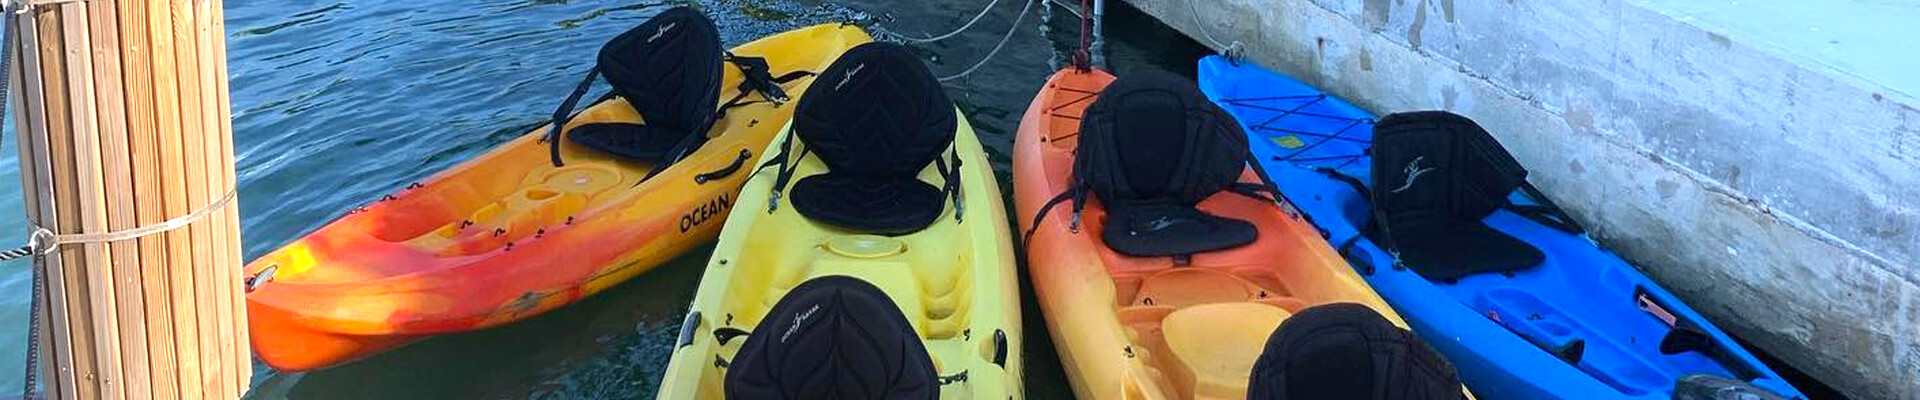 Kayak Delivery Service Miami